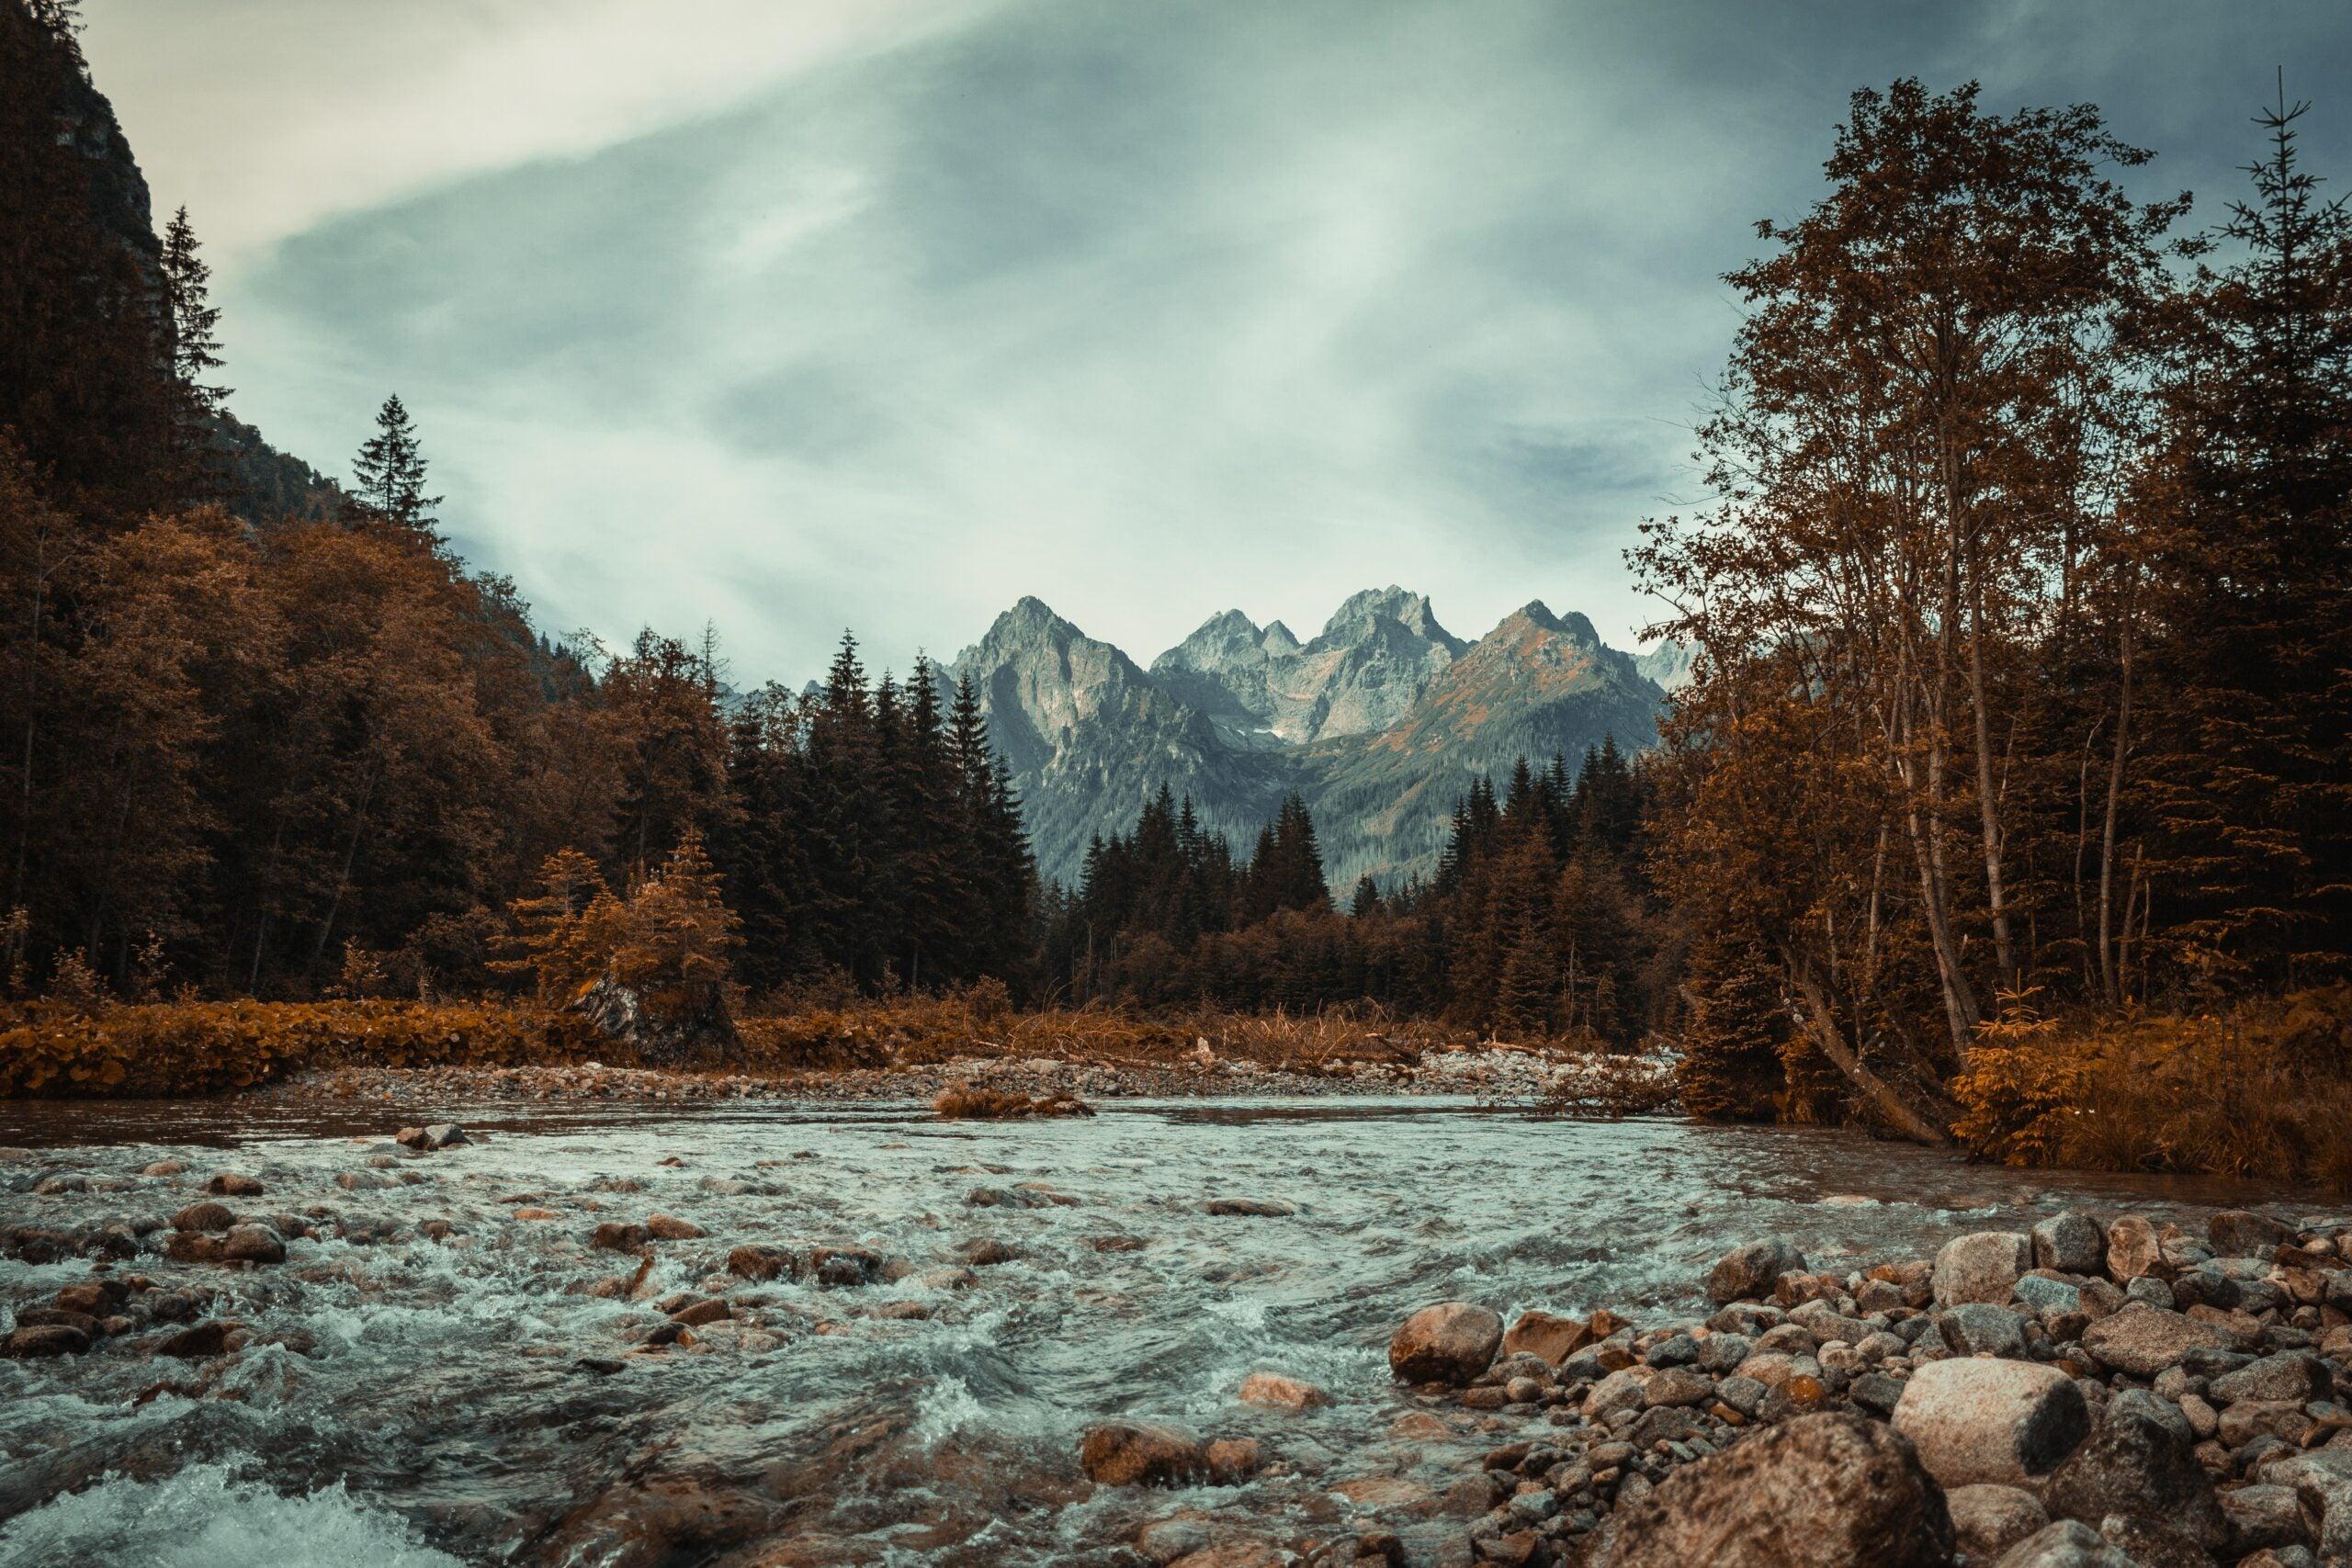 A stream in its natural habitat.